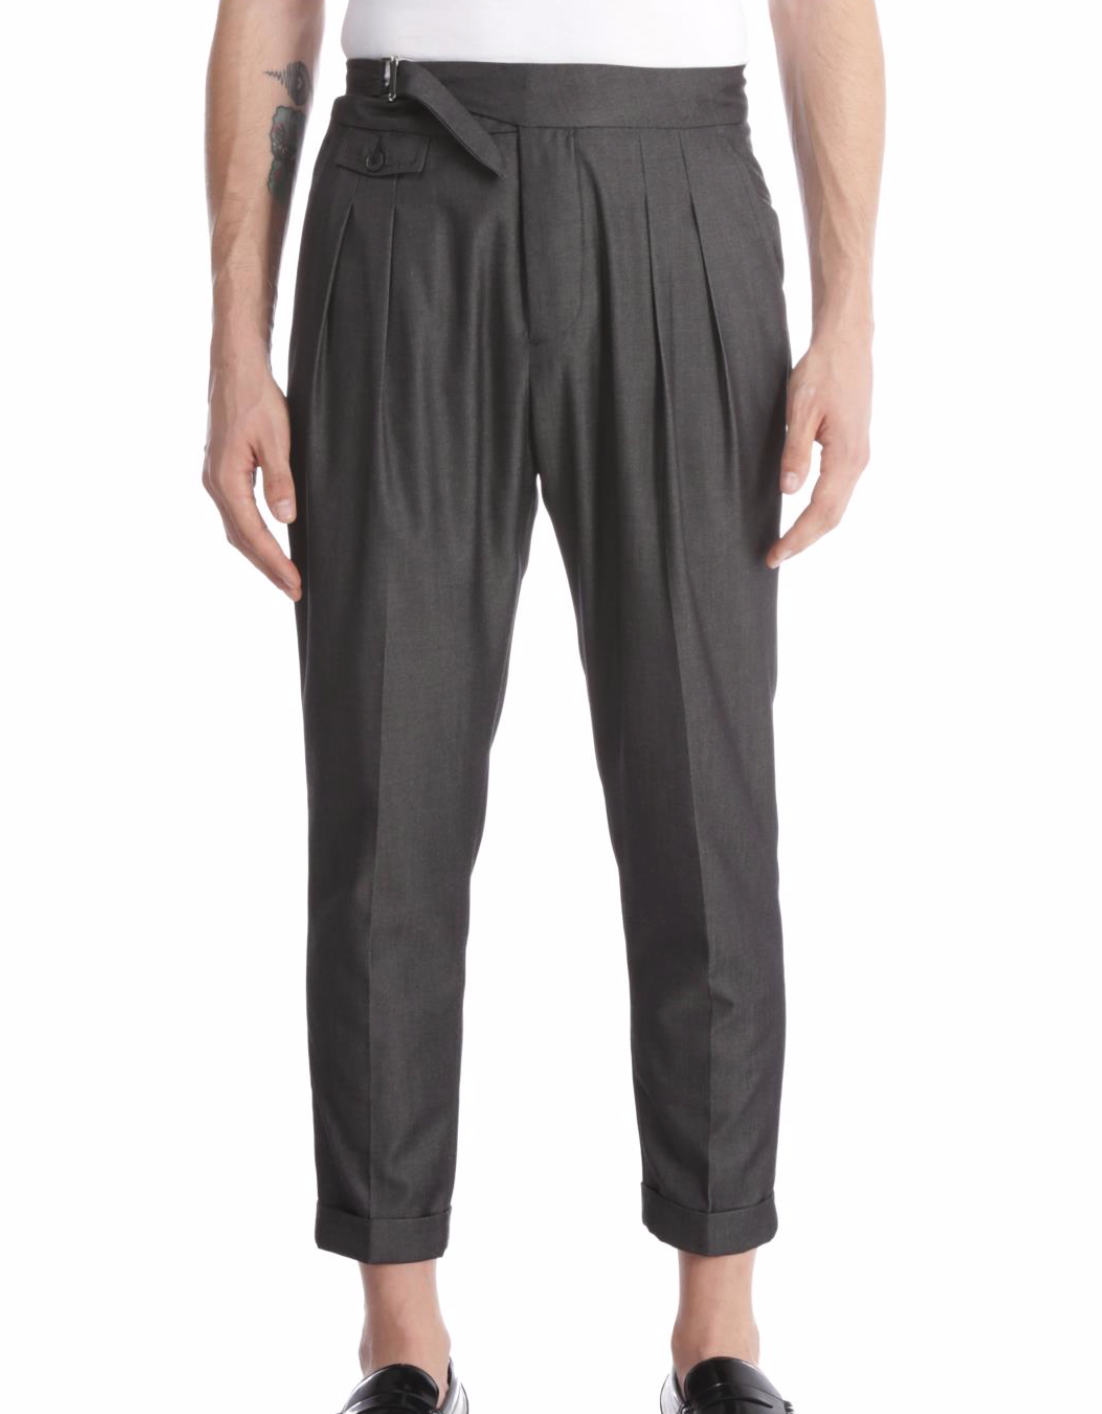 Pantalone con doppia pences Golden Craft GOLDEN CRAFT | Pantalone | GC1PFW20215514N038